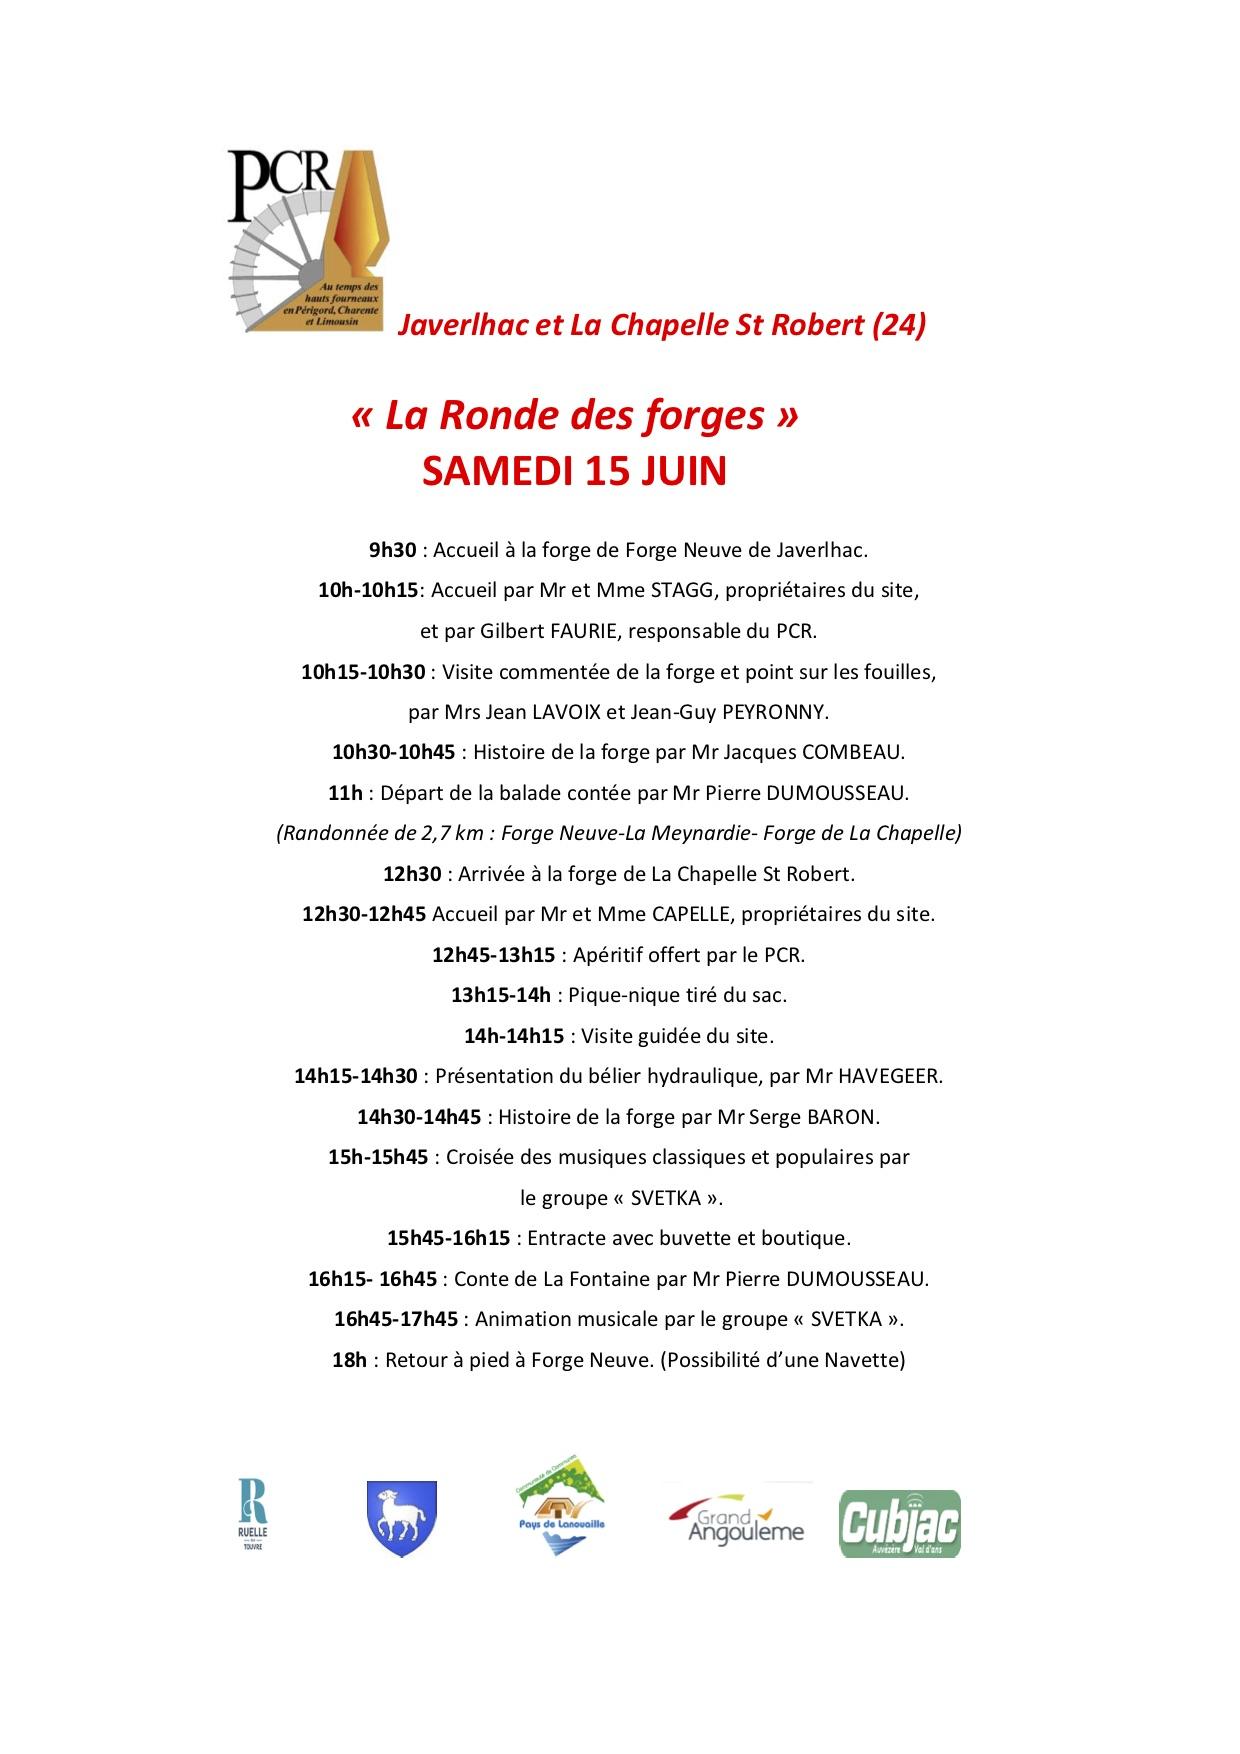 Invitation La ronde des forges 14-15 juin 2019.jpg